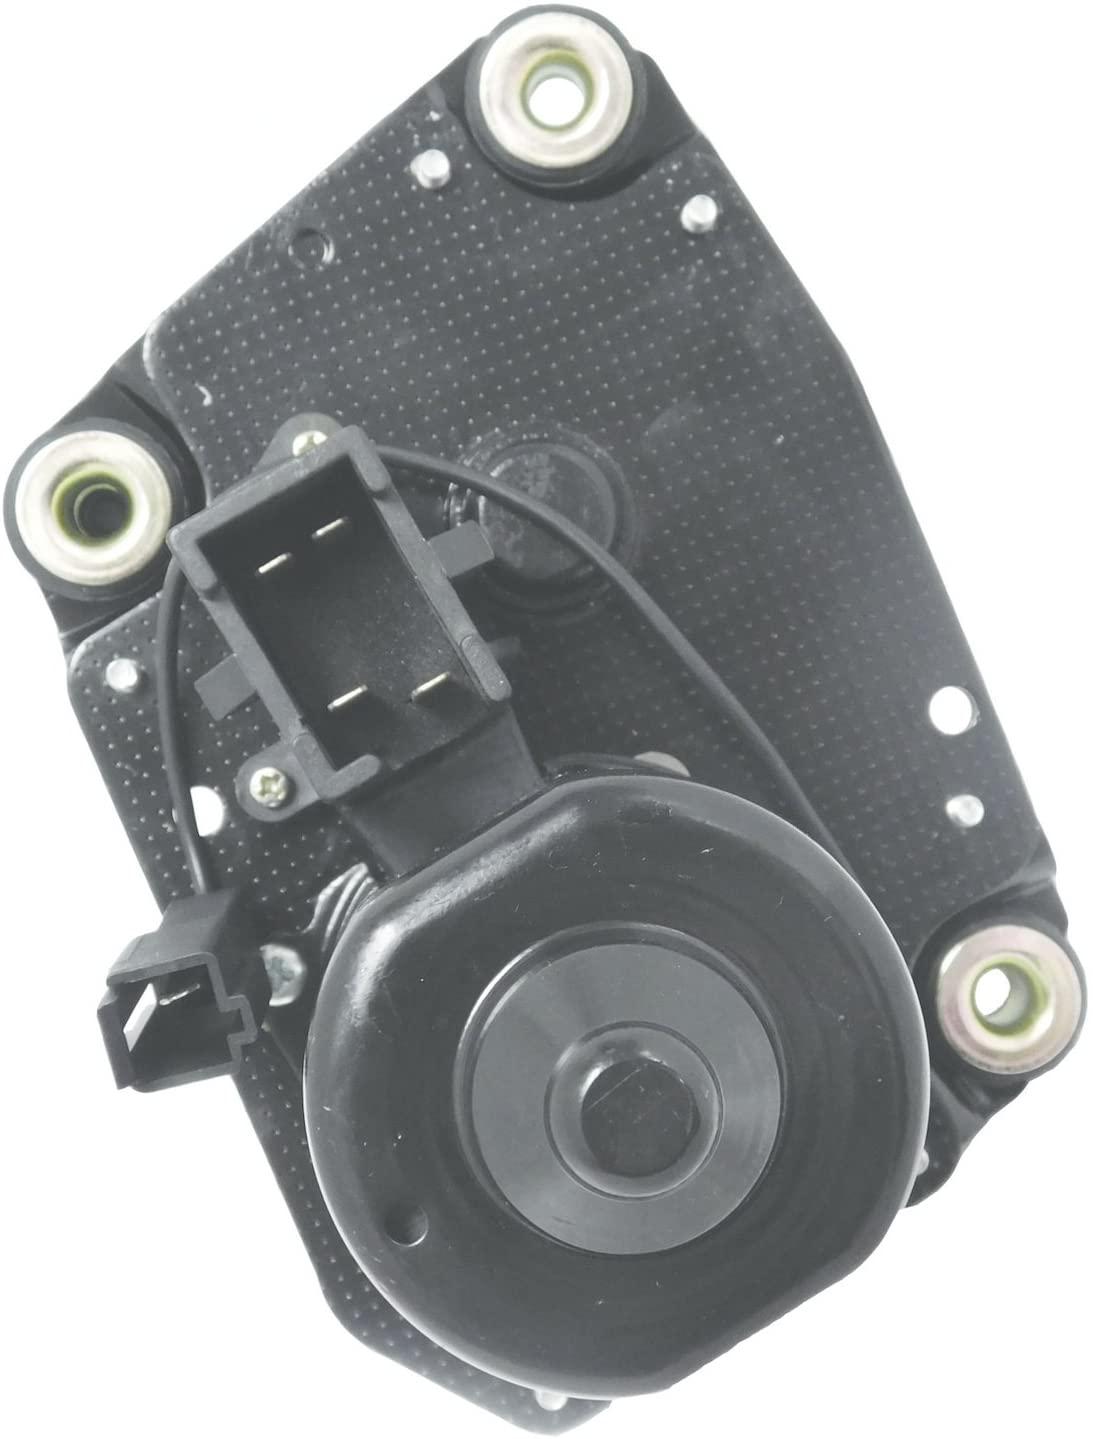 Rareelectrical NEW FRONT WIPER MOTOR COMPATIBLE WITH FORD AEROSTAR BASE 4WD XL E0TZ-17508-A E0TZ-17508-B E2TZ-17508-A E69Z-17508-B E79Z-17508-A